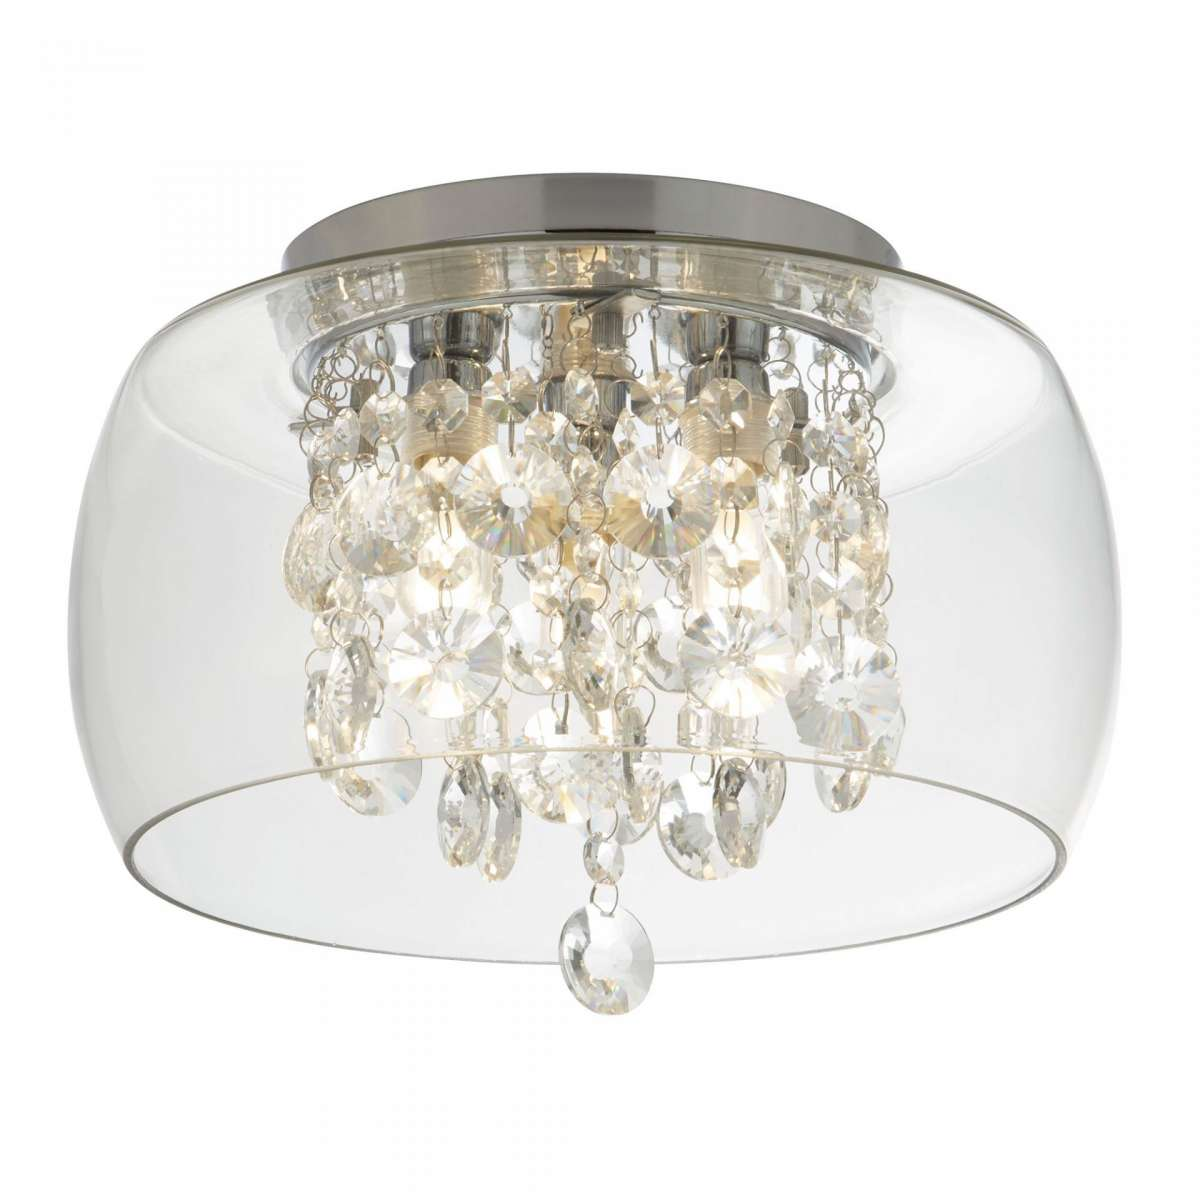 Bathroom Clear Glass Shade 3 Light Fluh With Crystal Drops